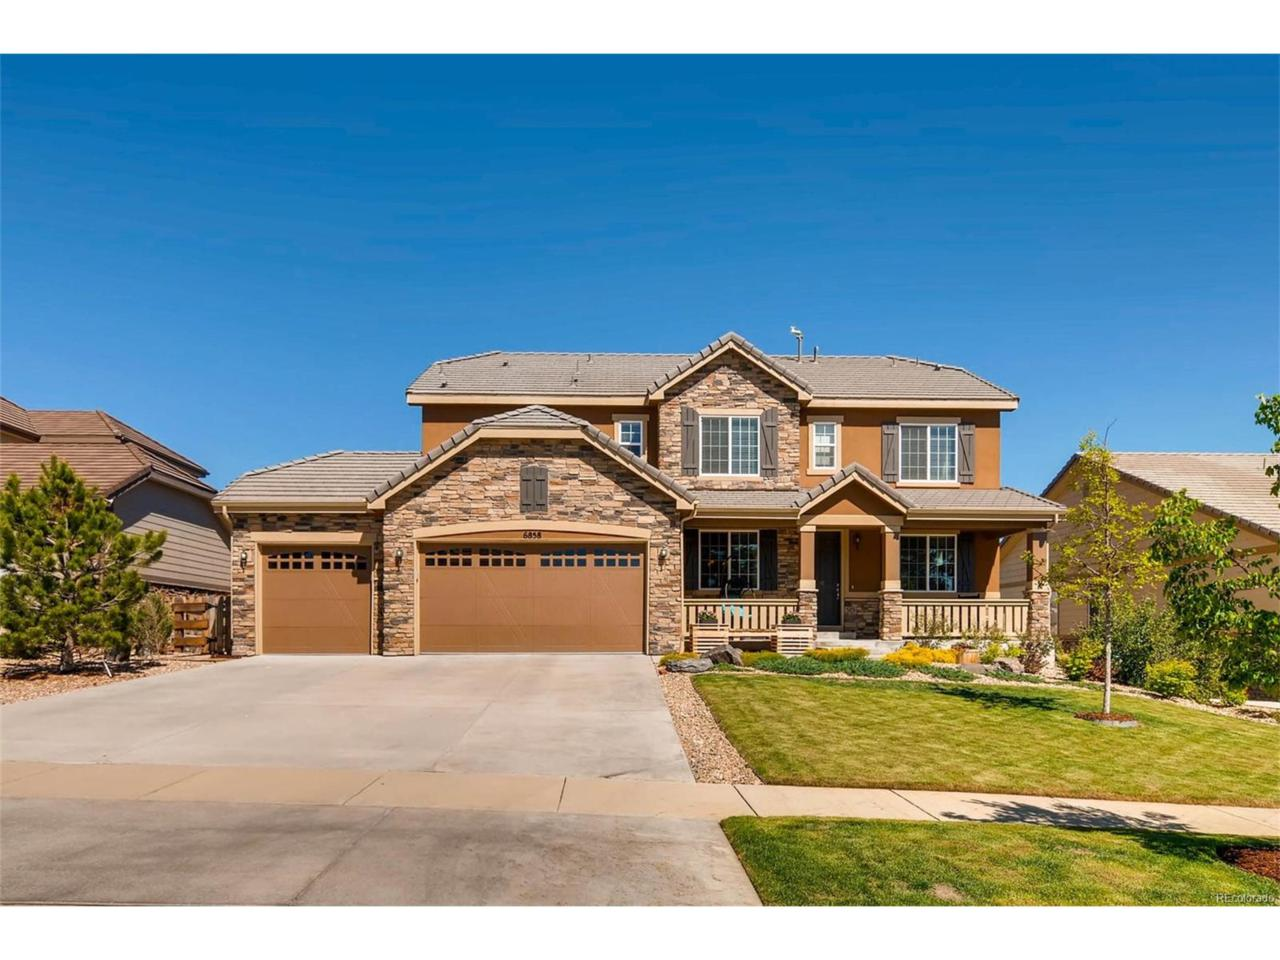 6858 S Duquesne Court, Aurora, CO 80016 (MLS #7393948) :: 8z Real Estate